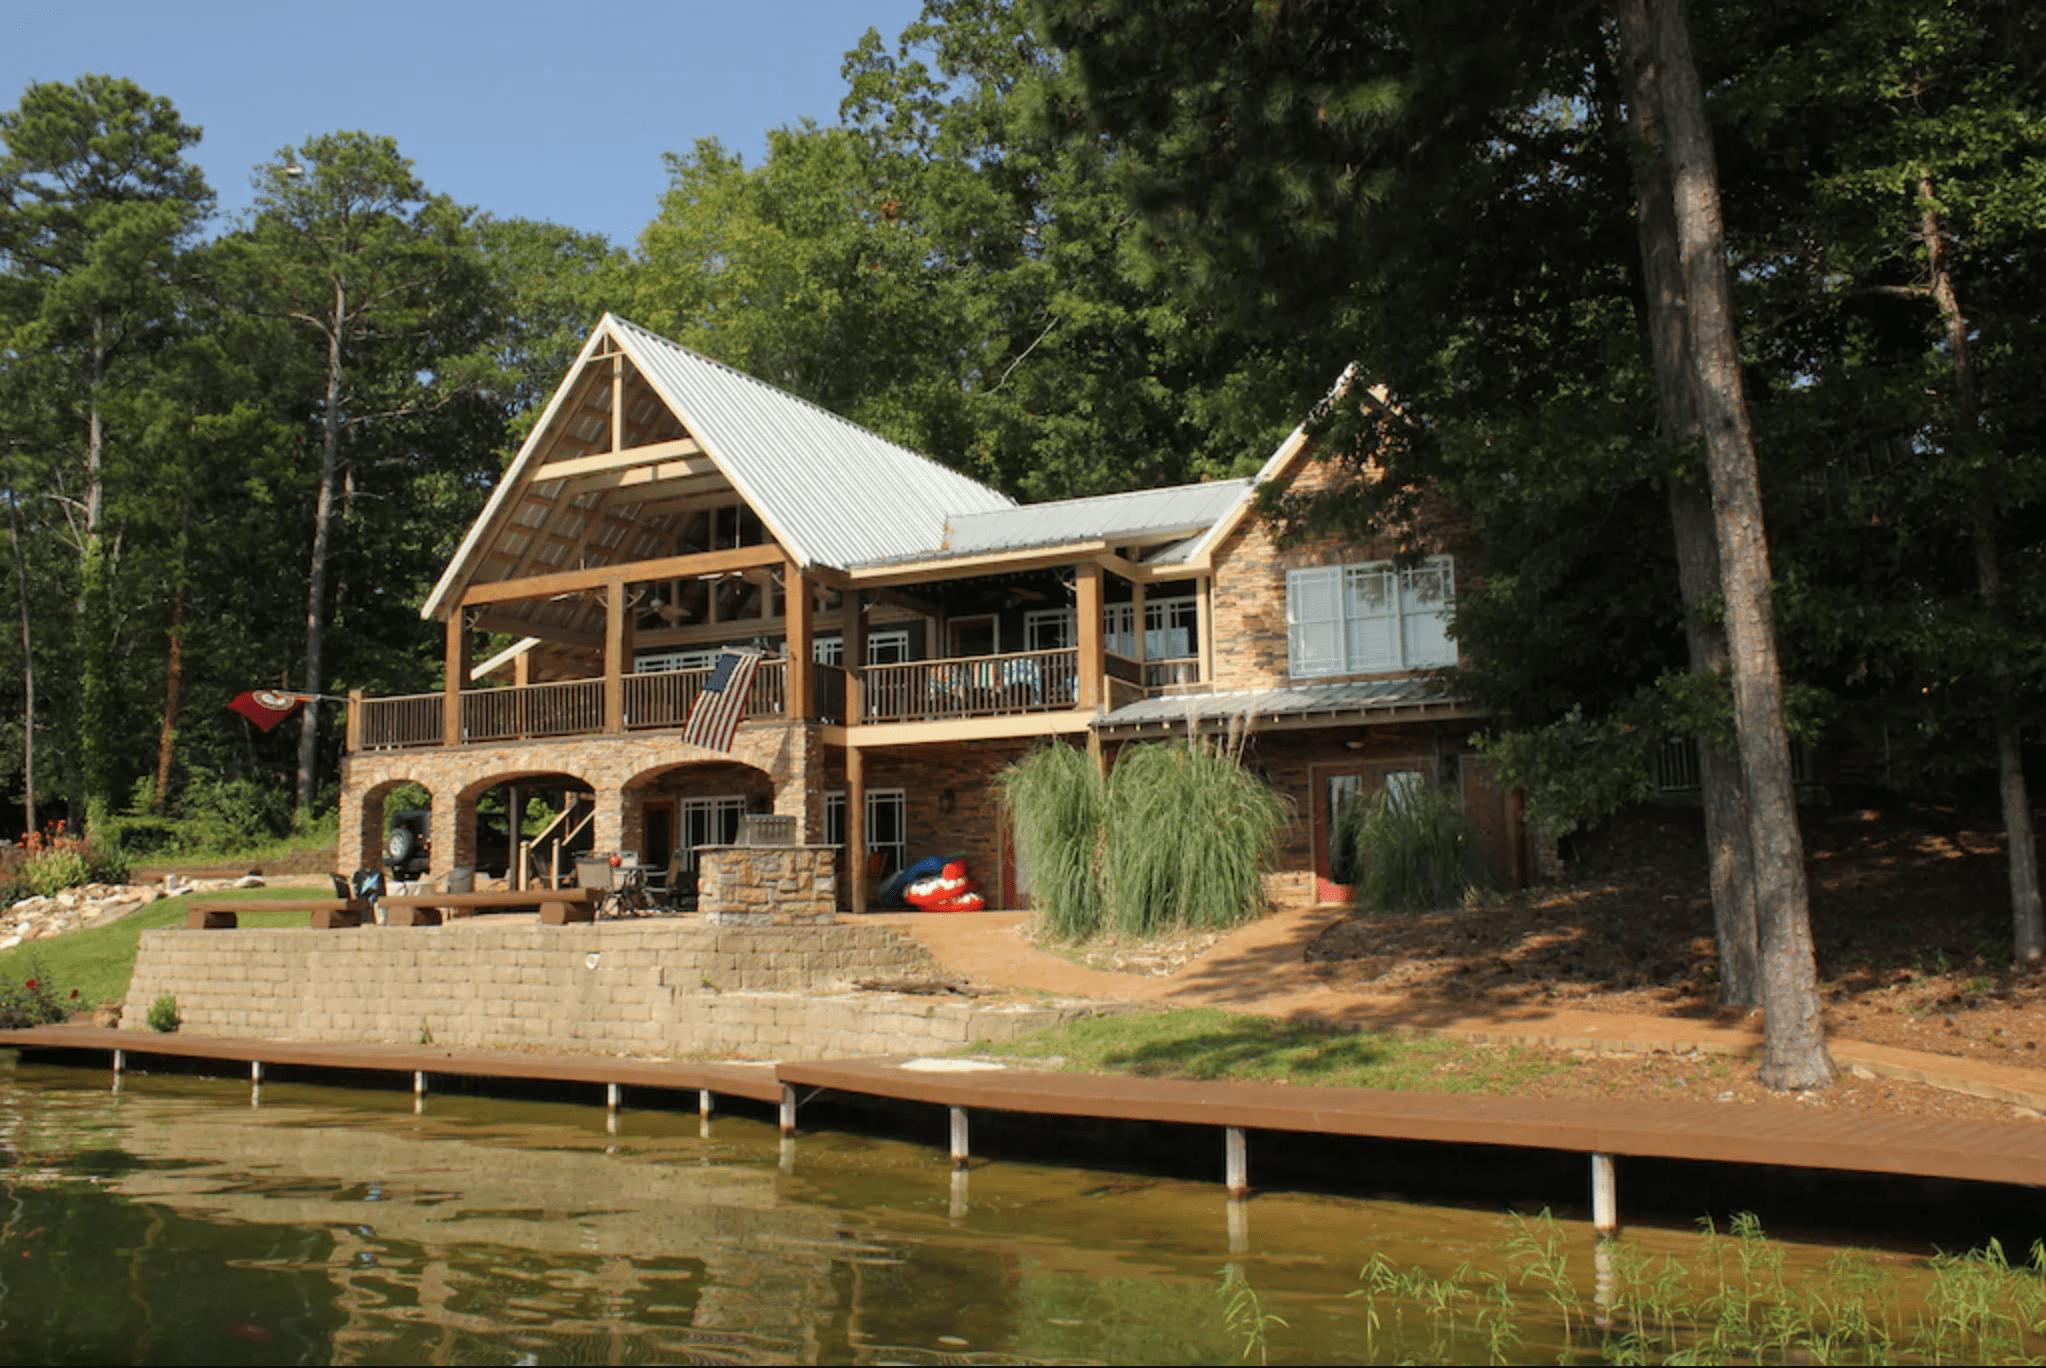 Million-dollar views: Lake Martin, Alabama